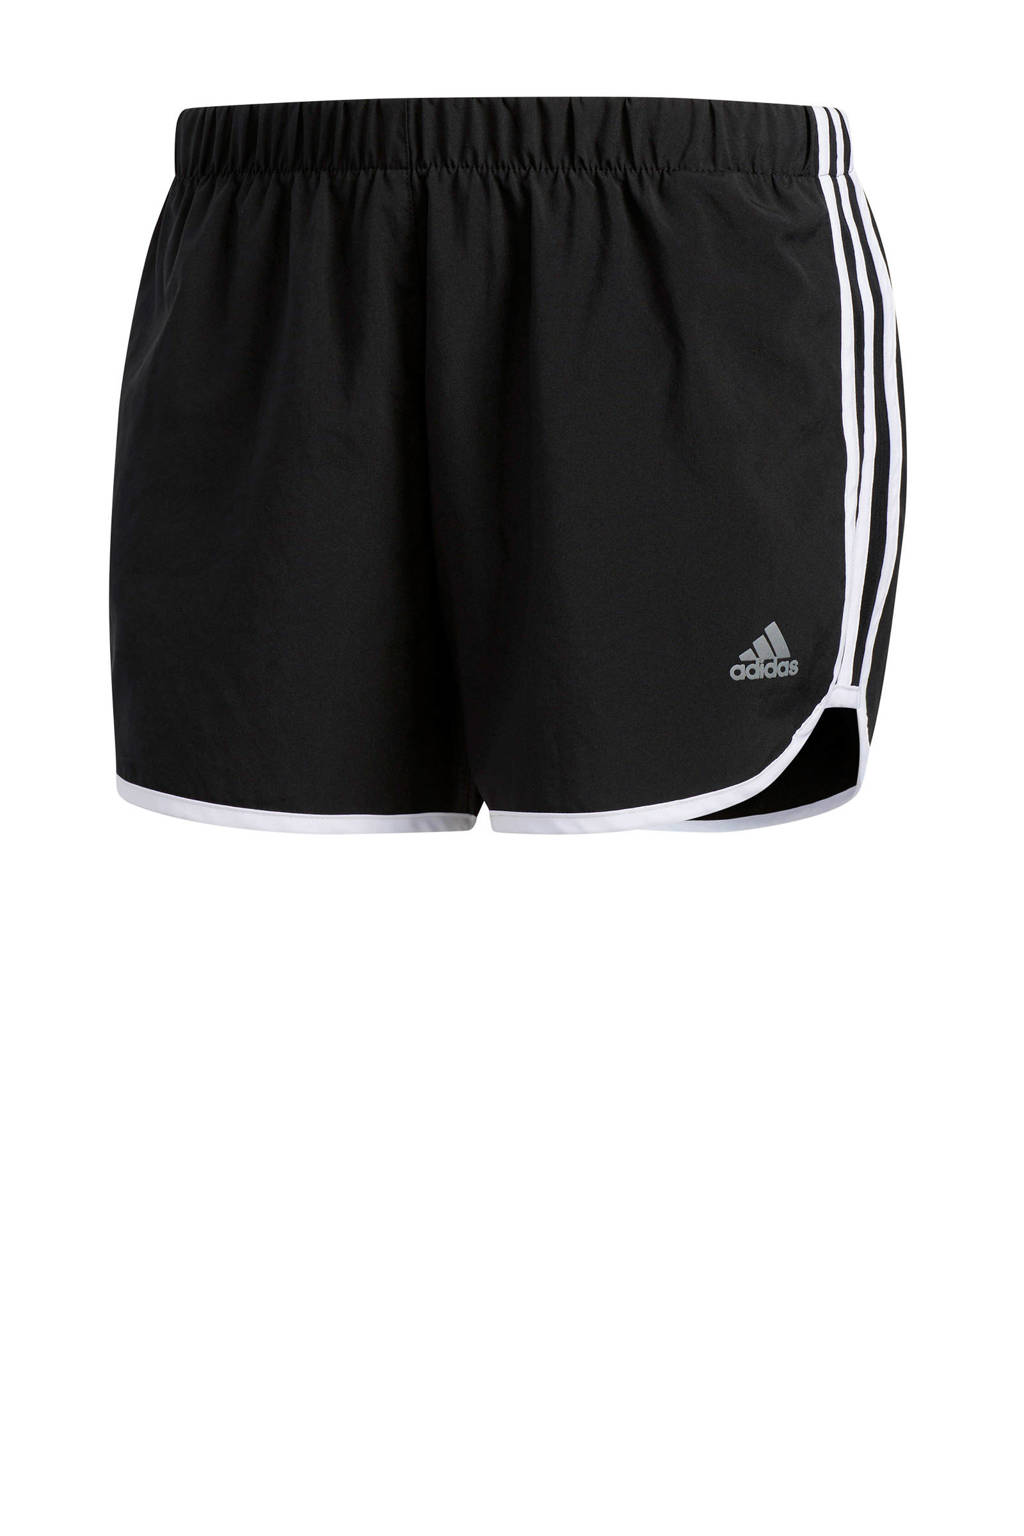 adidas Performance hardloopshort zwart, Zwart/wit